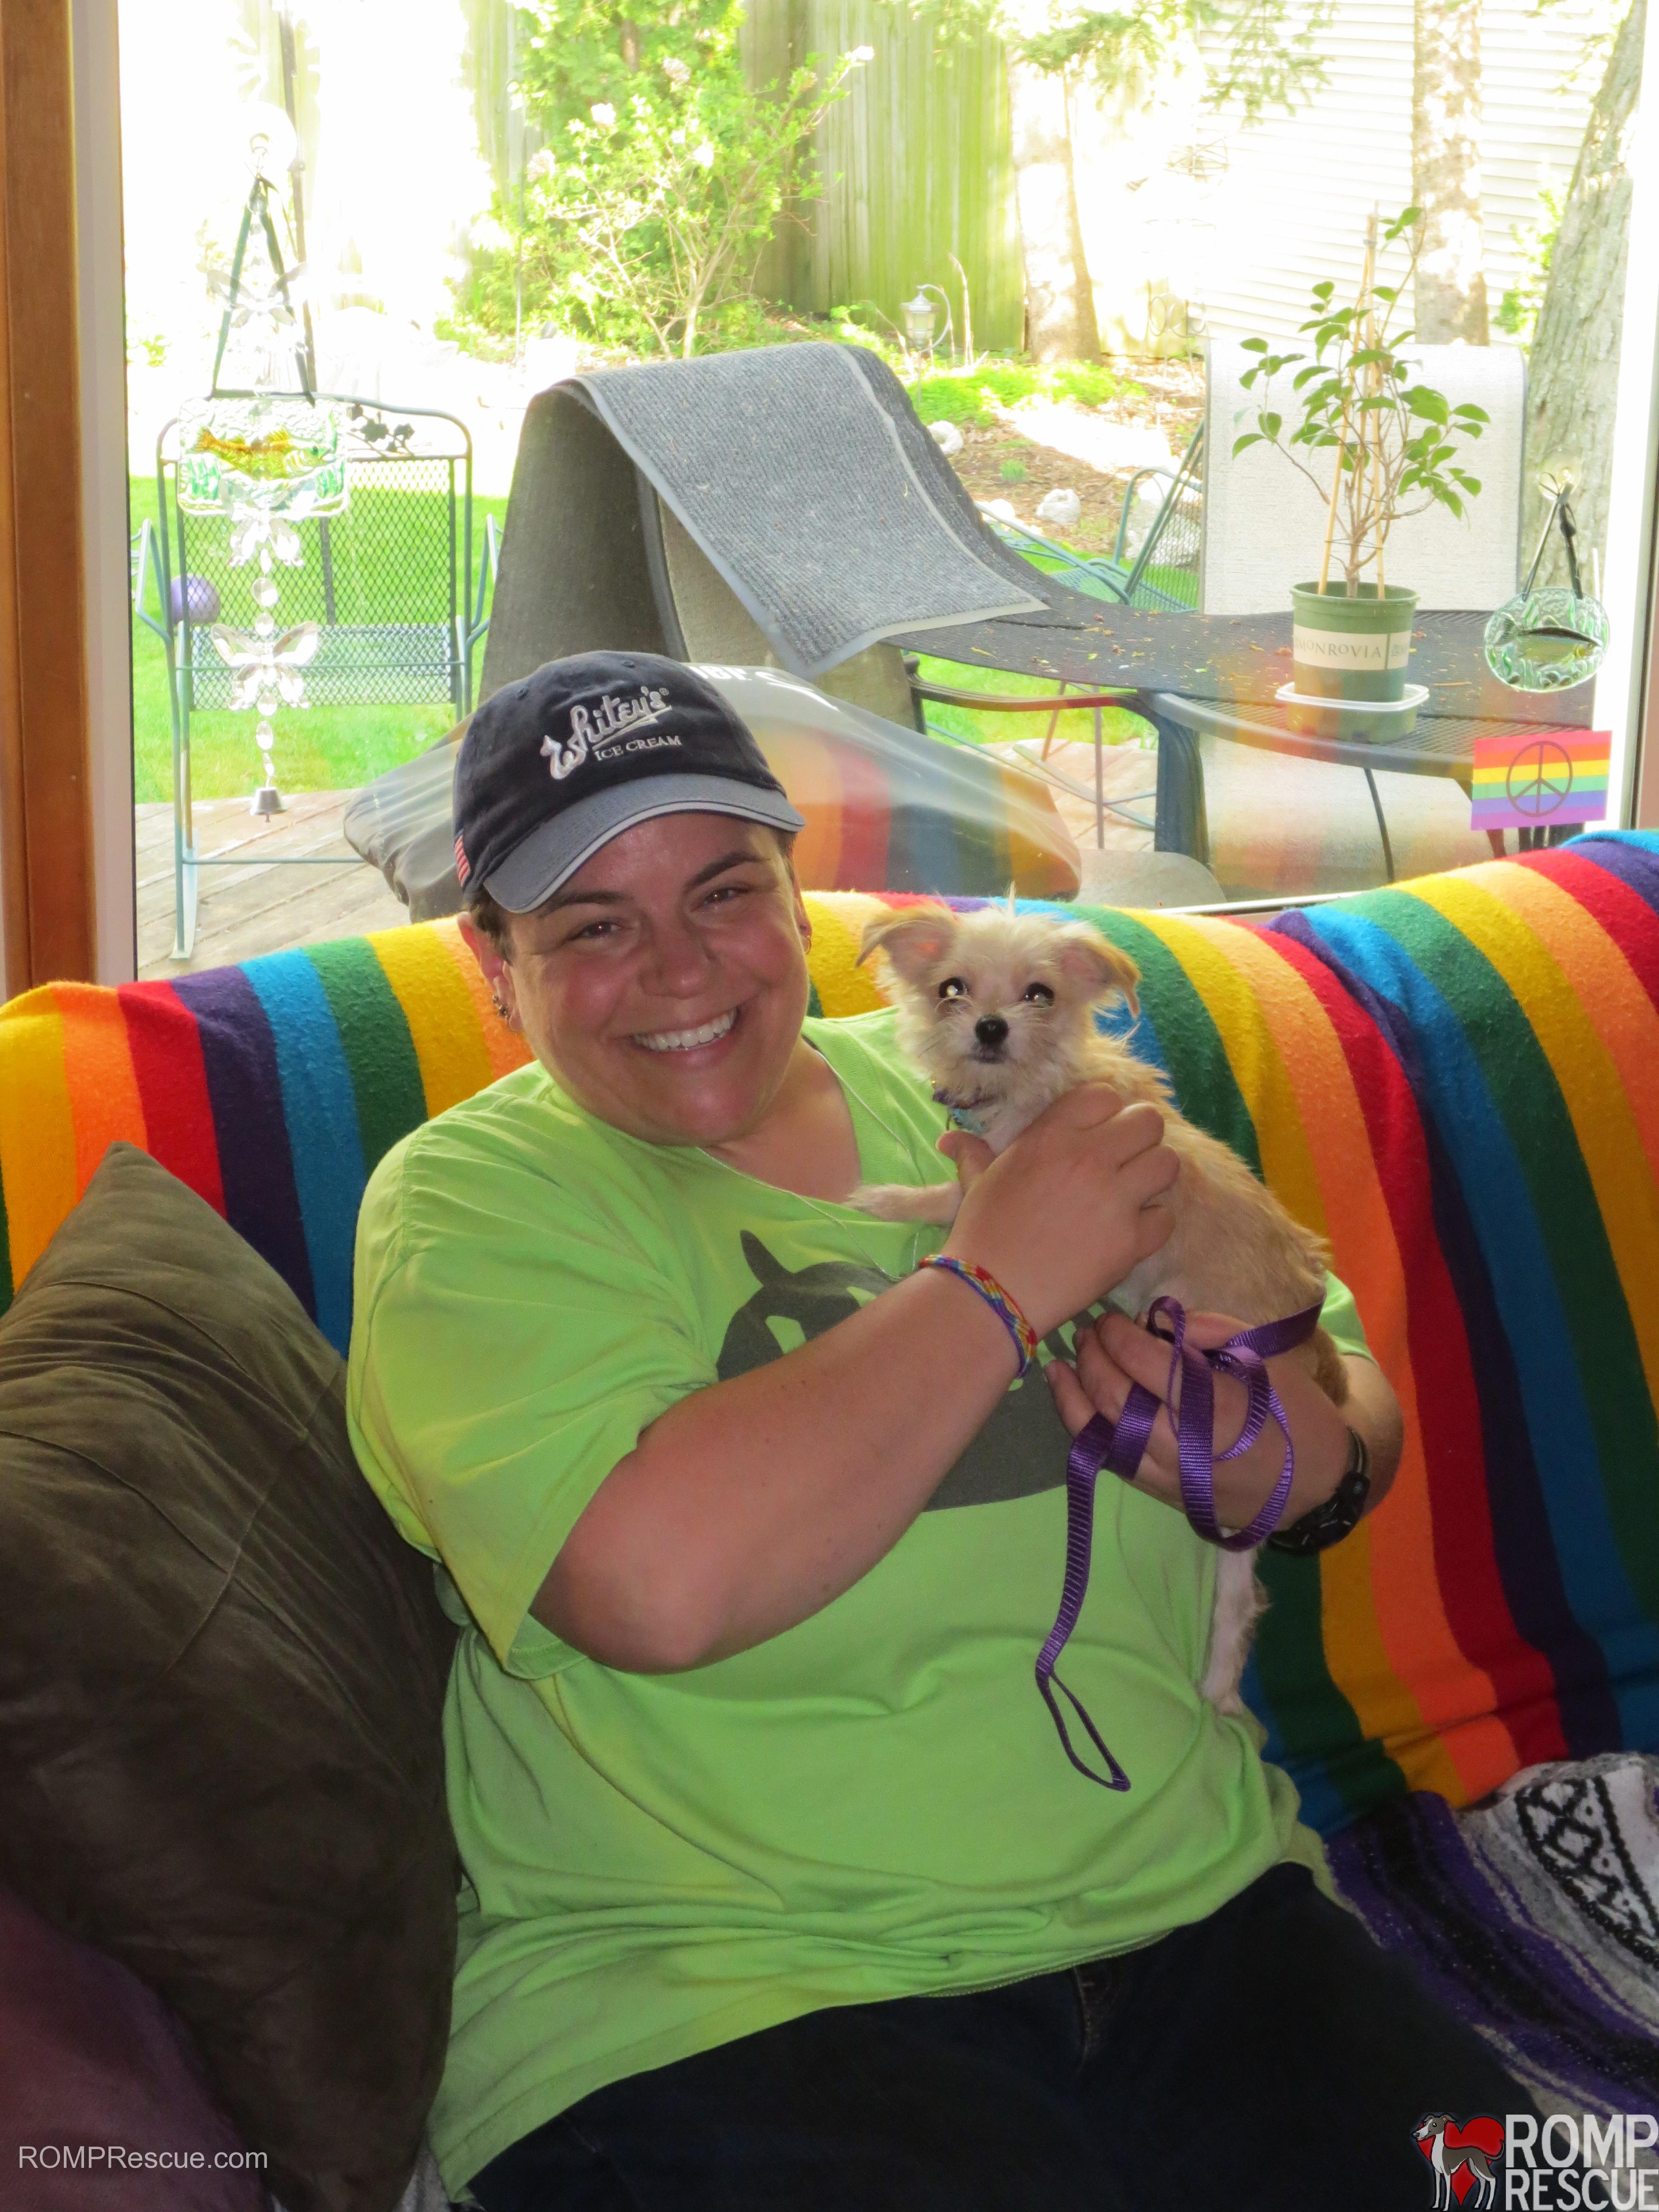 Chicago Small Dog Rescue, italian greyhound adoption, italian greyhound rescue, chicago, cooper, beckham, romp rescue, dewey